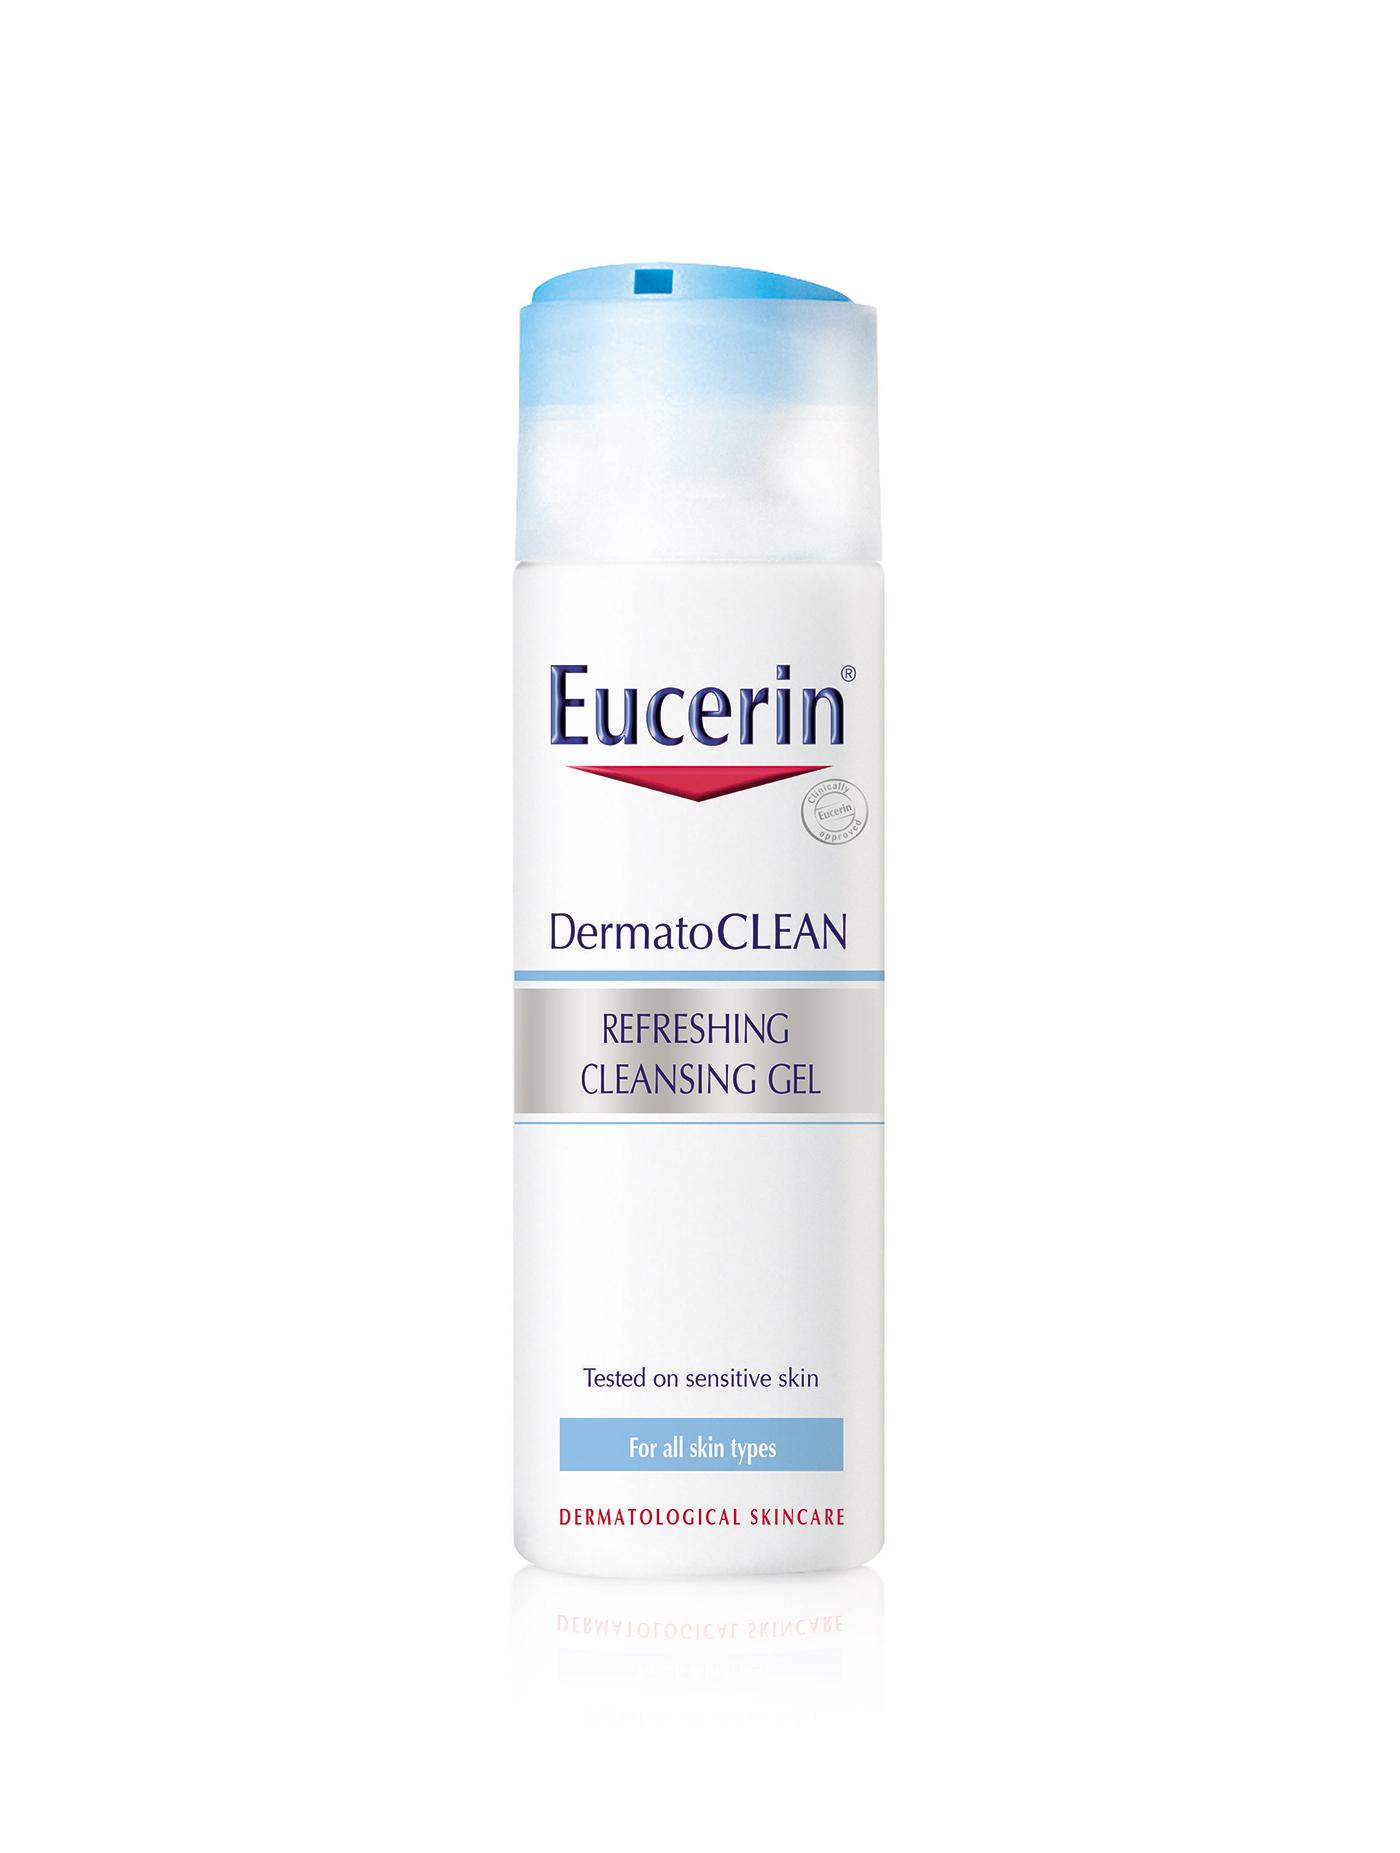 EUCERIN เจลทำความสะอาดผิวหน้า คลีนซิ่ง เจล เดอร์มาโทคลีน รีเฟรชซิ่ง ขนาด 200 มล.